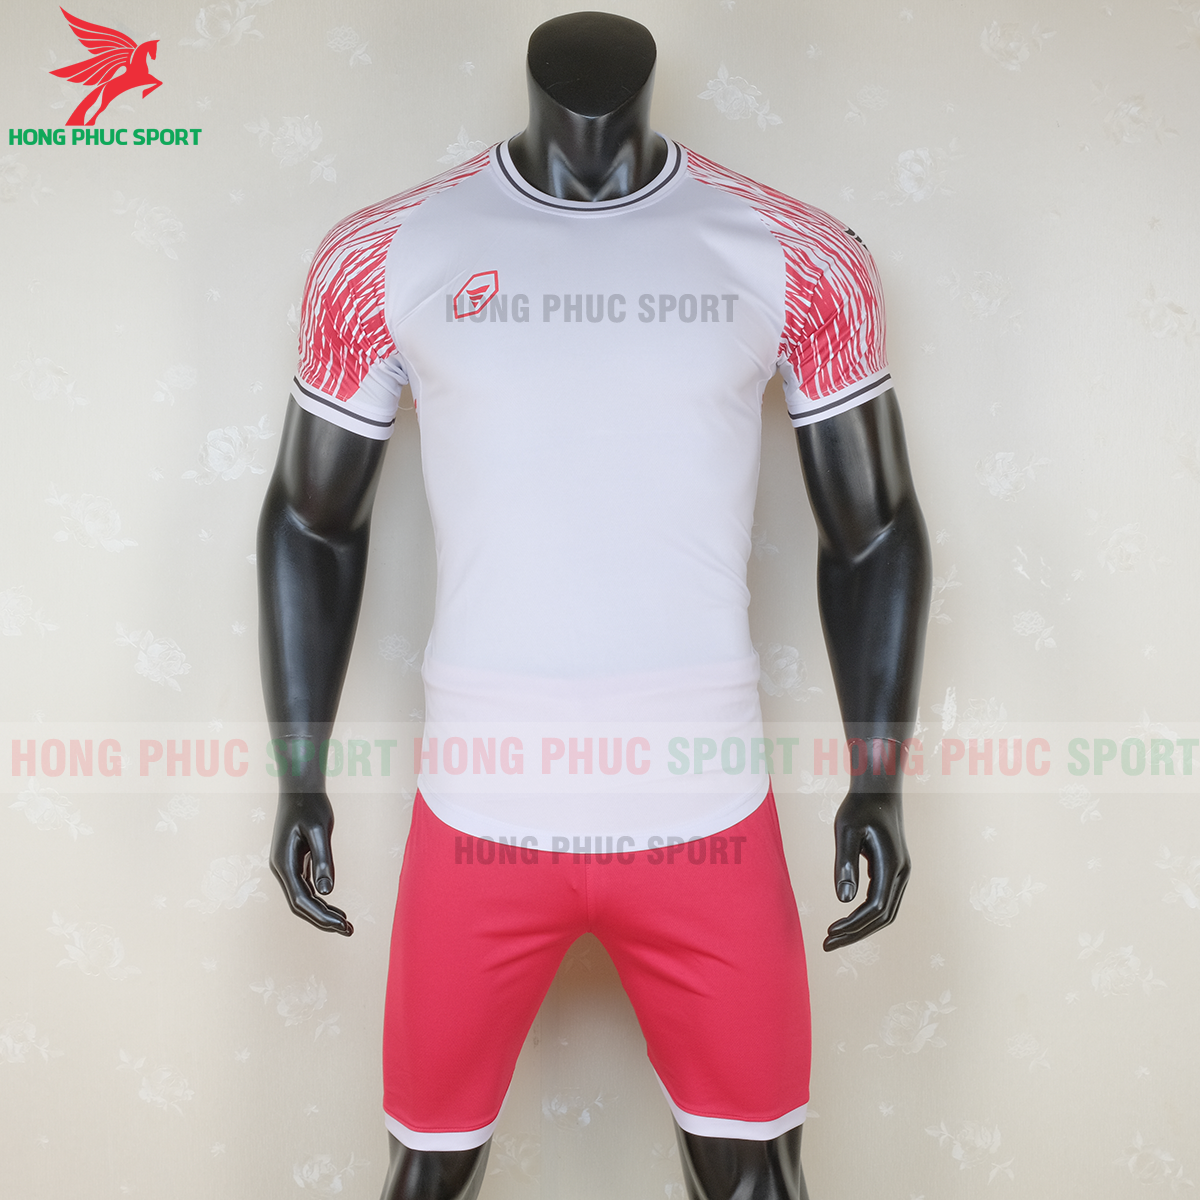 https://cdn.hongphucsport.com/unsafe/s4.shopbay.vn/files/285/ao-bong-da-khong-logo-ta-a06-mau-3-1-5f728cae9c0e7.png